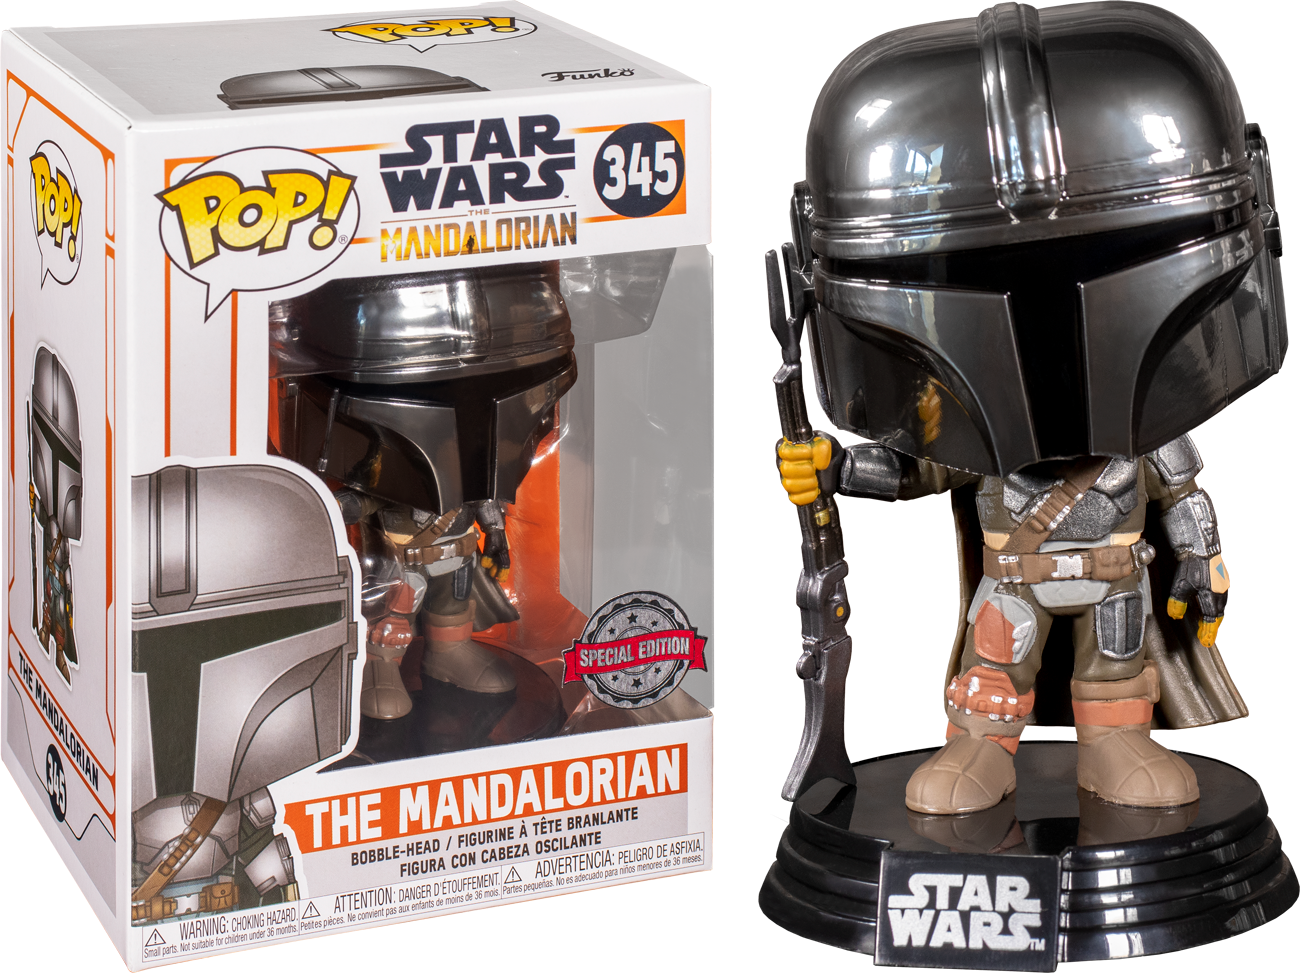 Star Wars: The Mandalorian - Mandalorian Chrome US Exclusive Pop! Vinyl